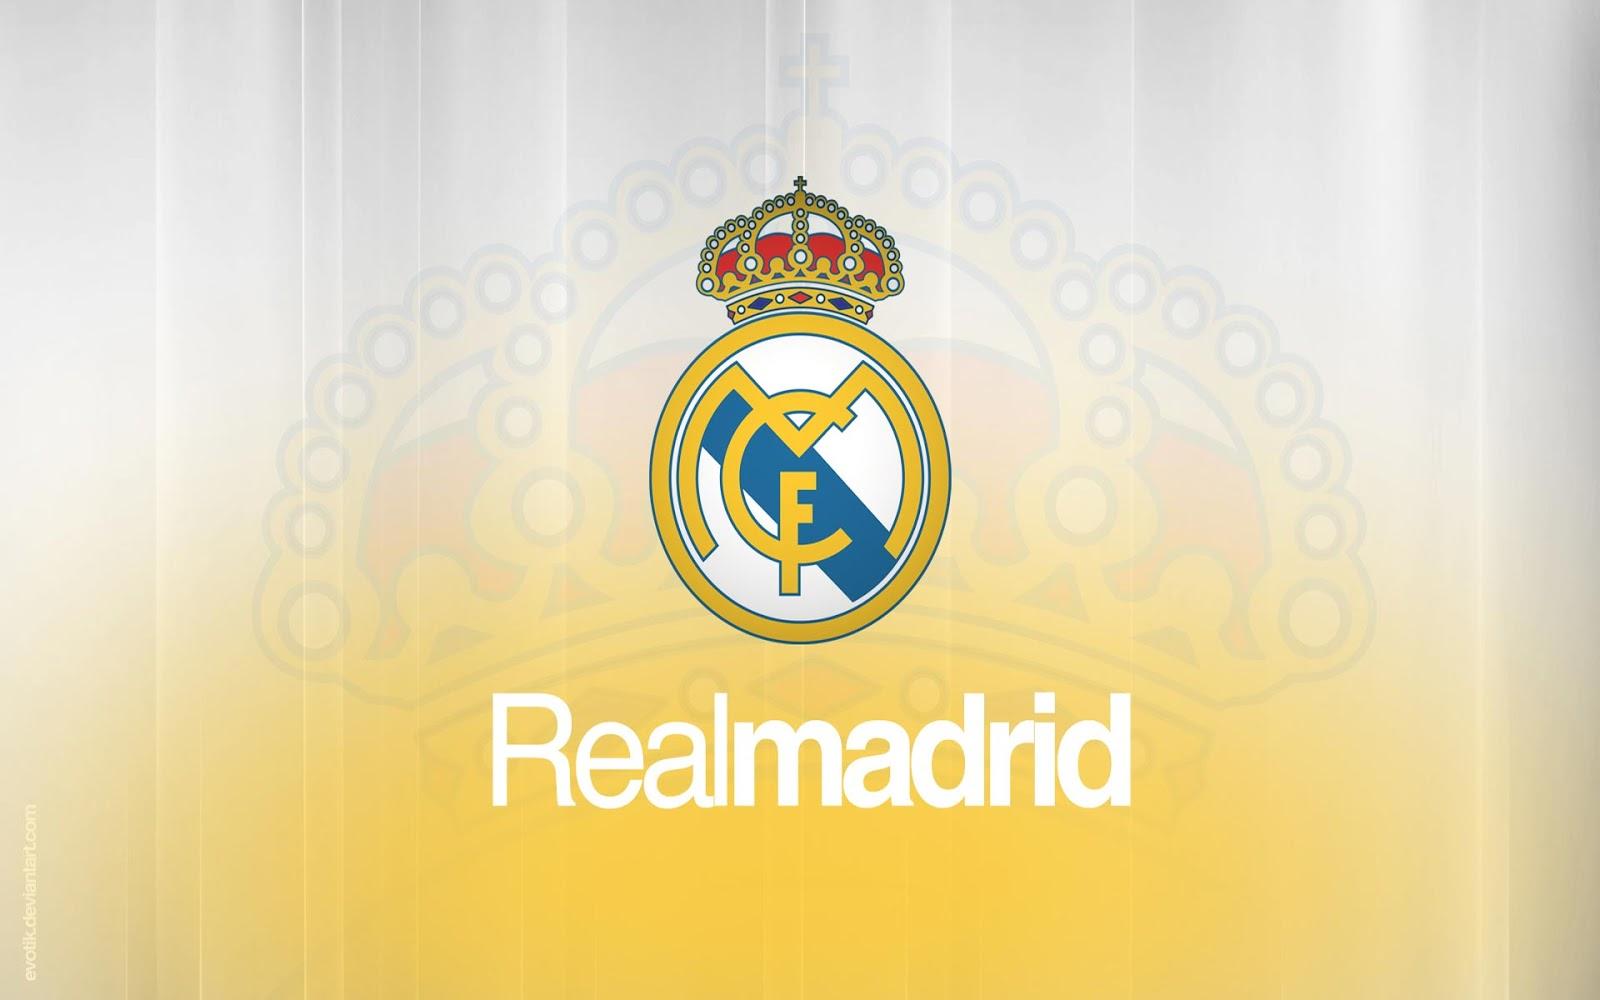 http://3.bp.blogspot.com/-ek_6WB6rQa8/UO8Ivv_lIqI/AAAAAAAADjs/X88zCziCK0E/s1600/Real-Madrid-Logo-Wallpapers+02.jpg